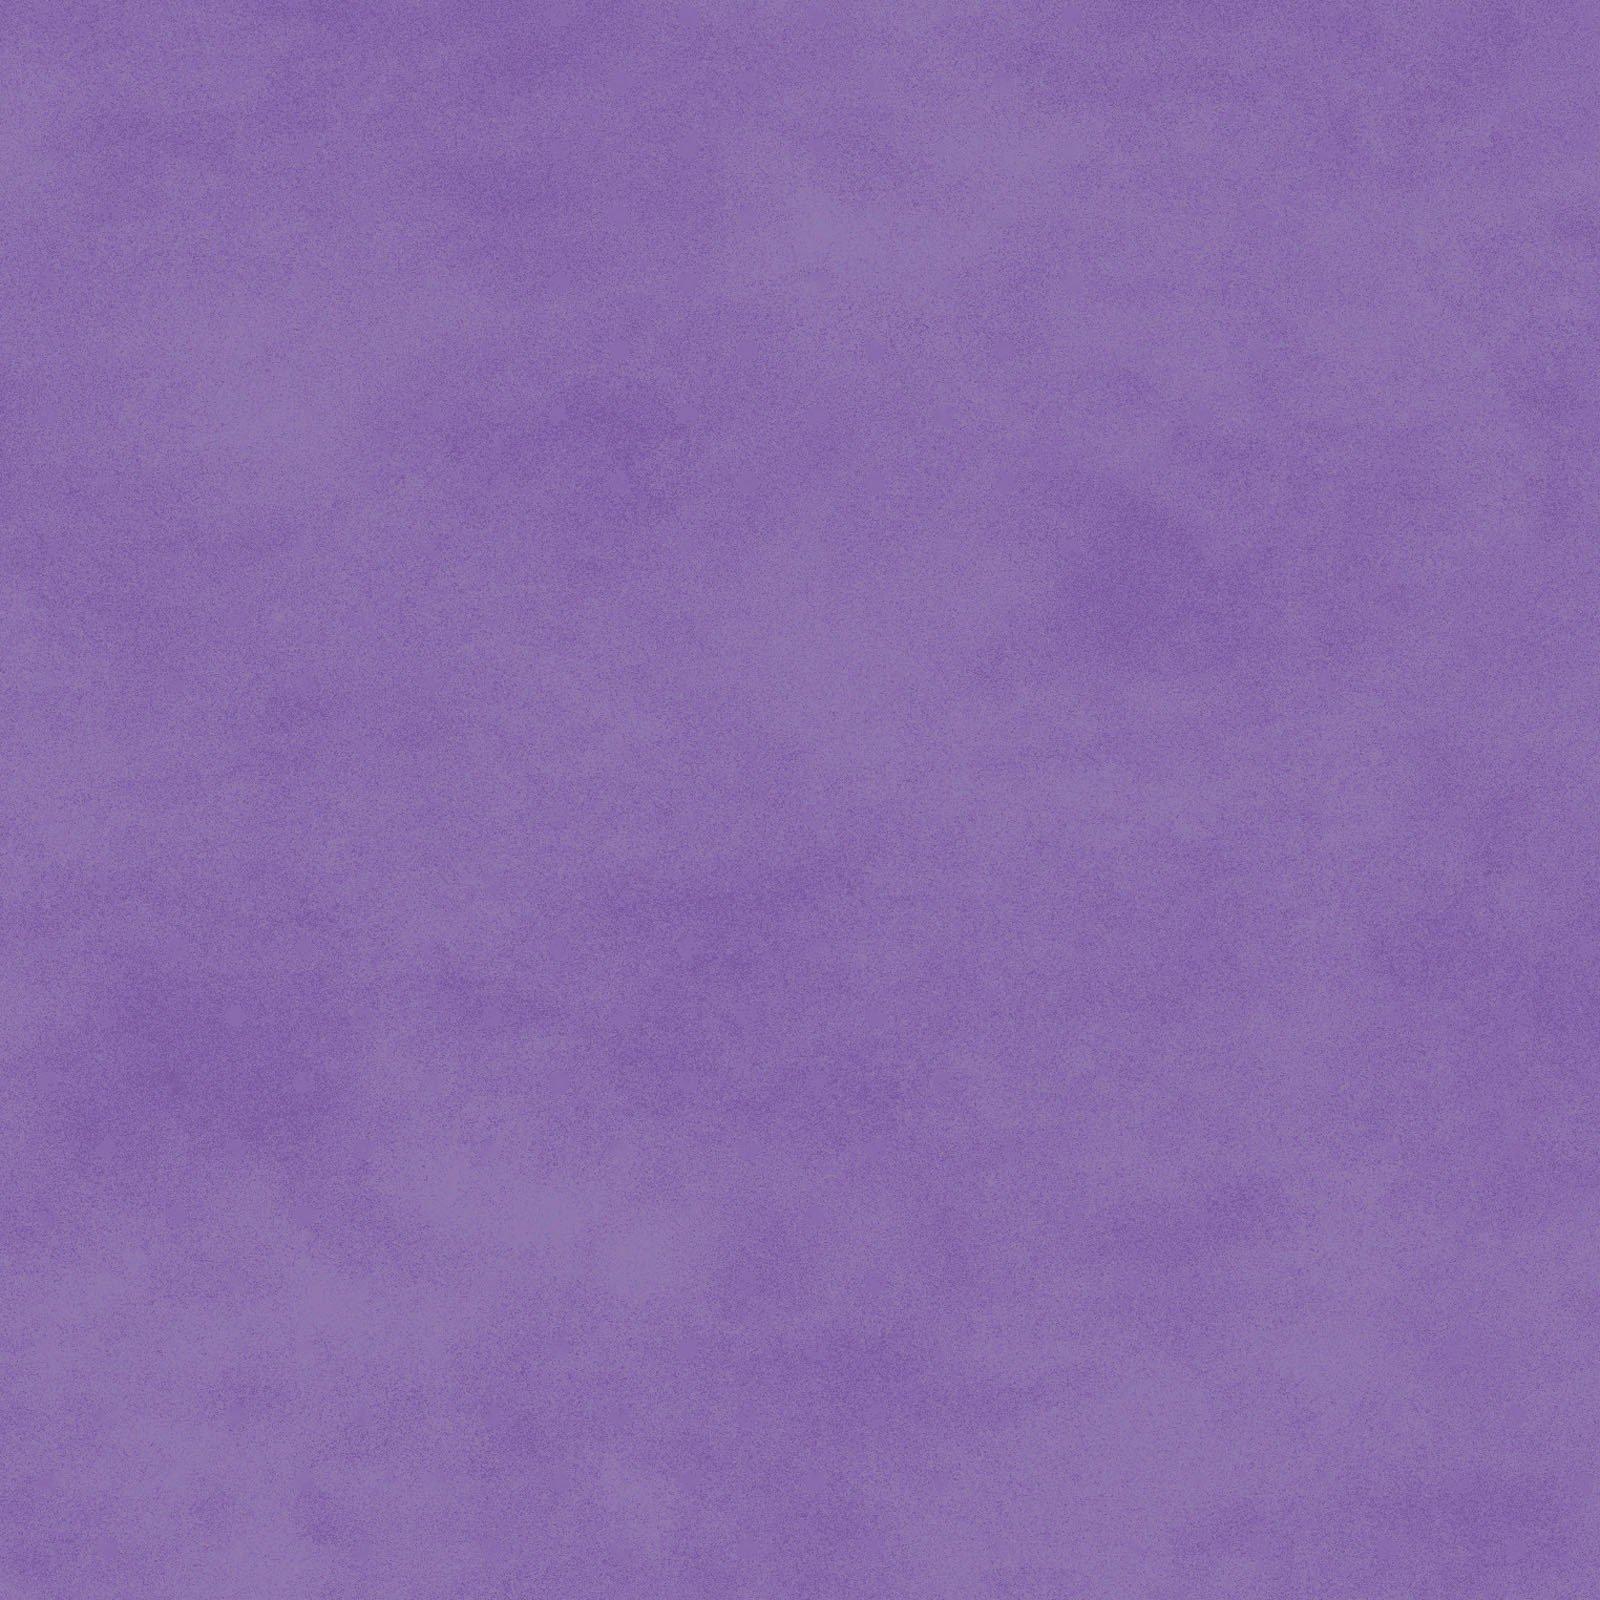 Shadowplay Violet Tulip<br/>Maywood Studio 513-V60S